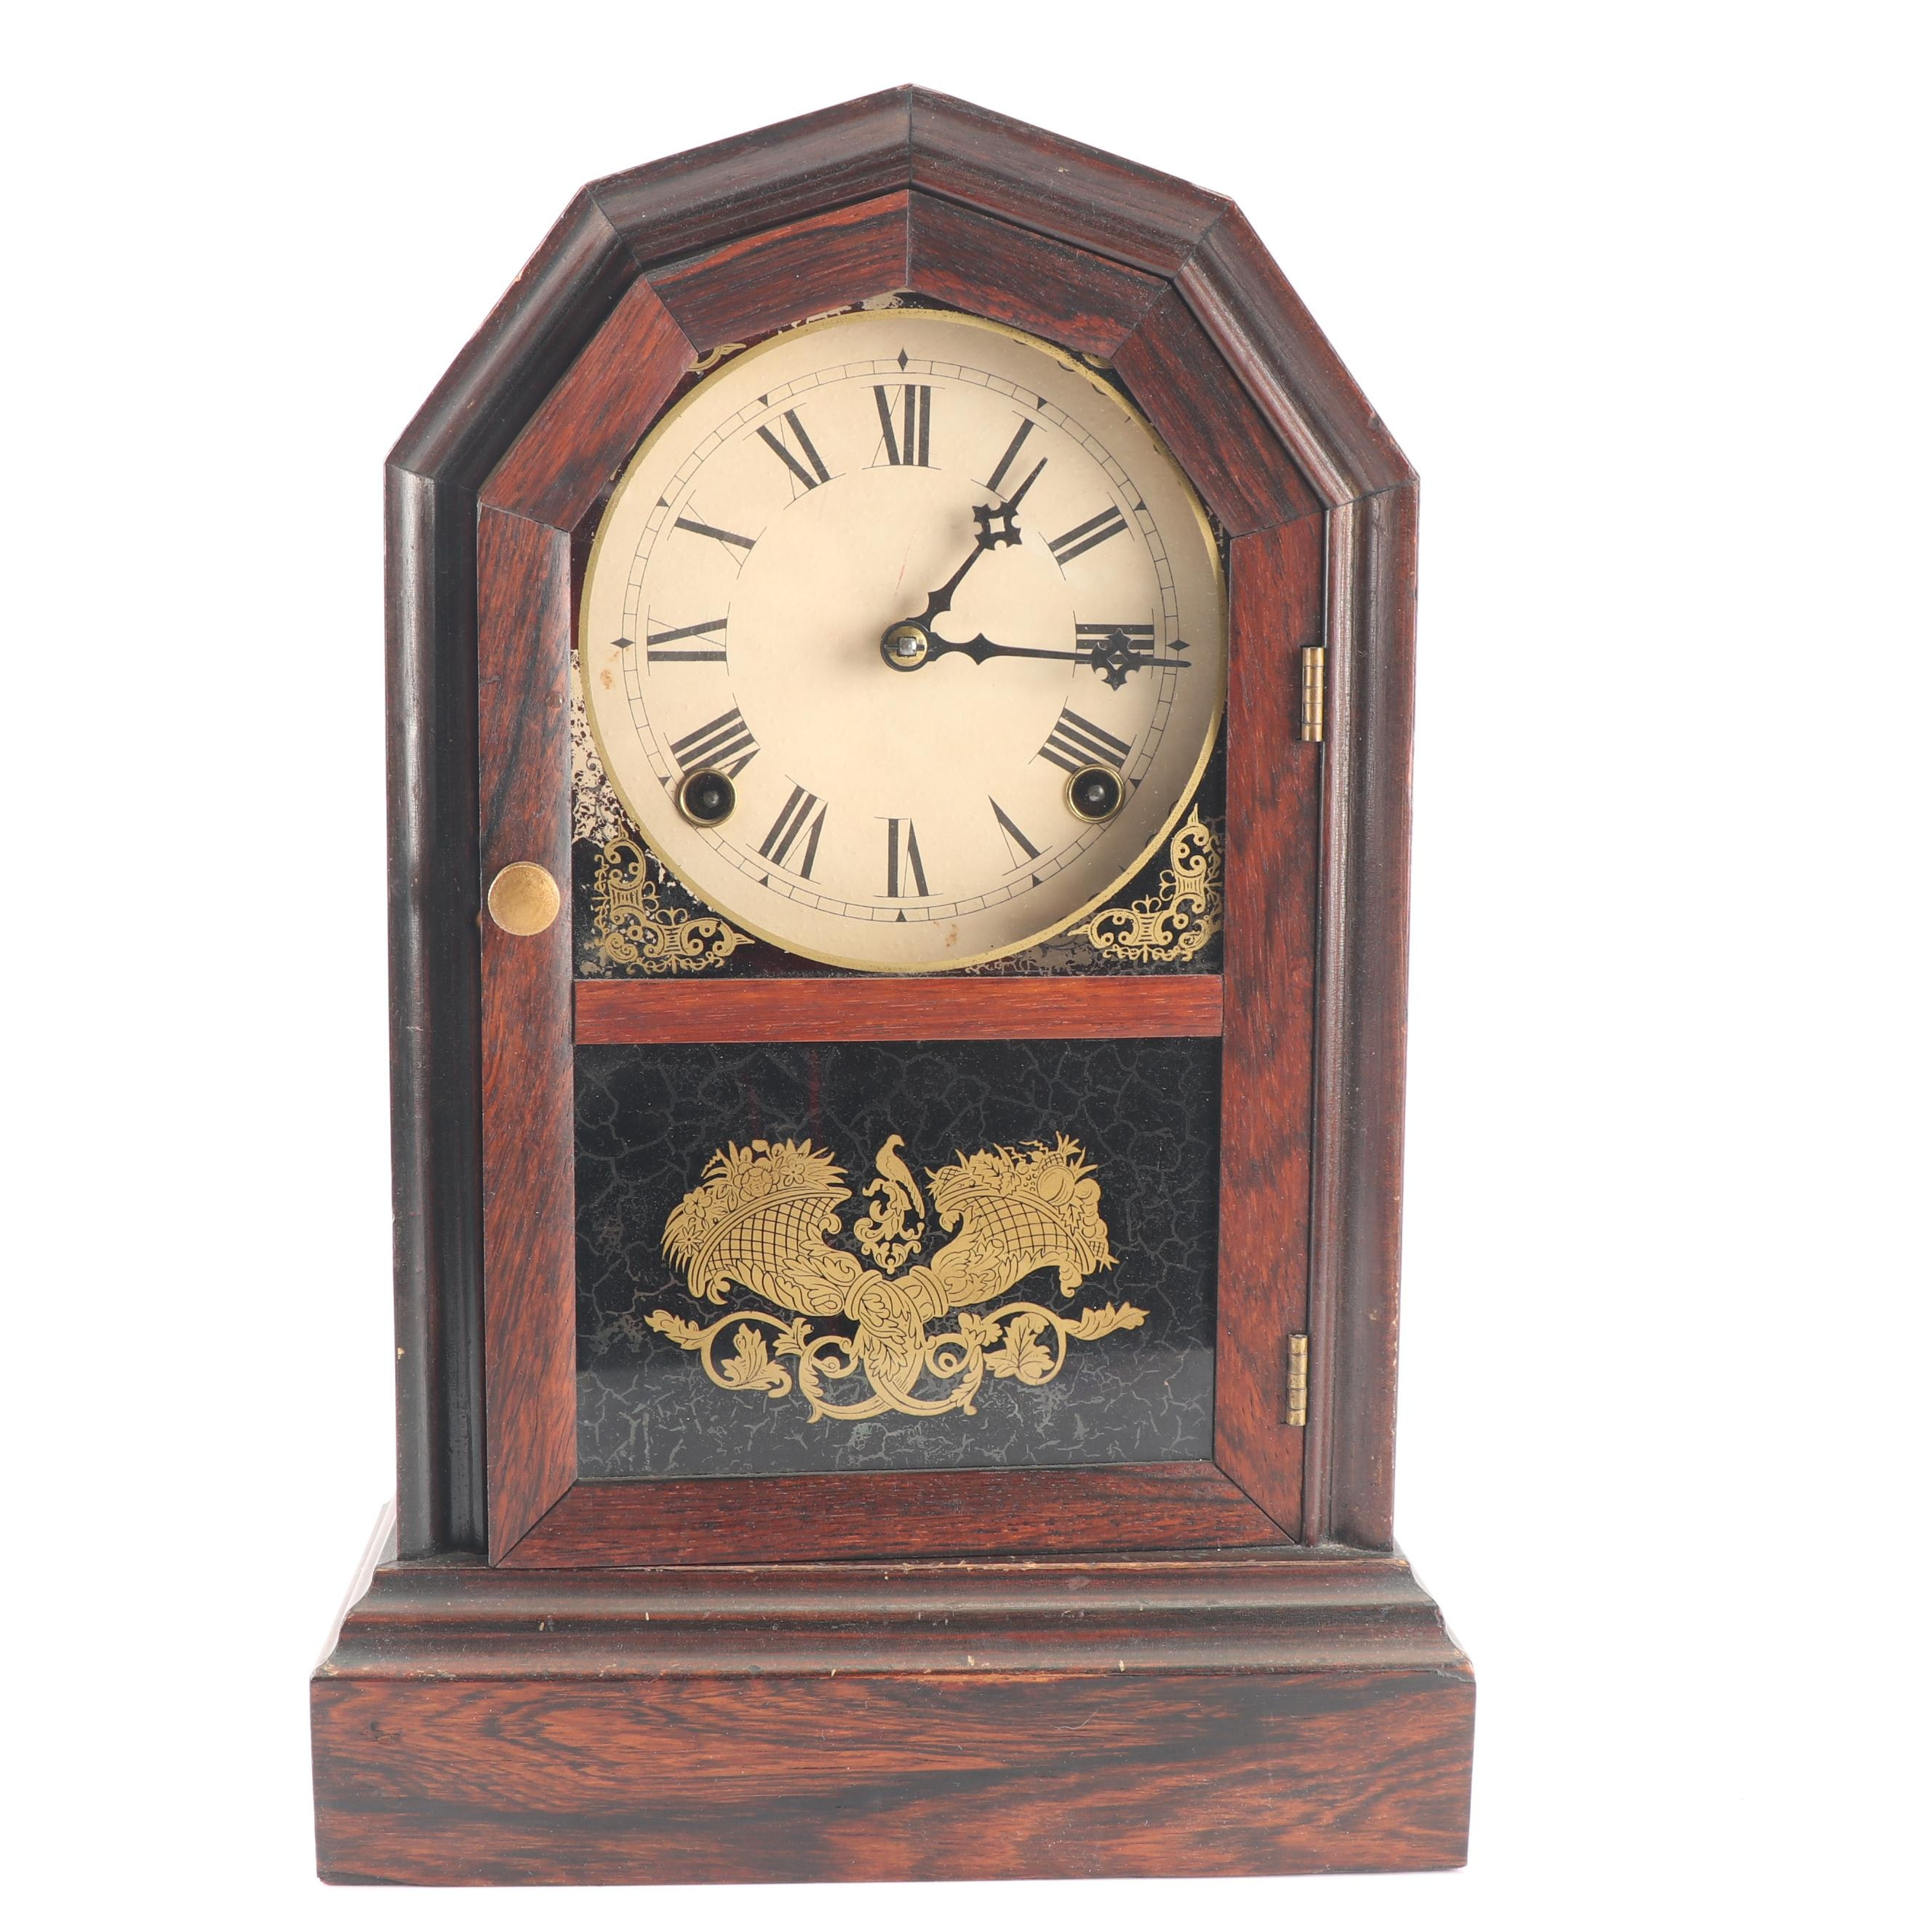 Atkins Rosewood Mantel Clock, 19th Century